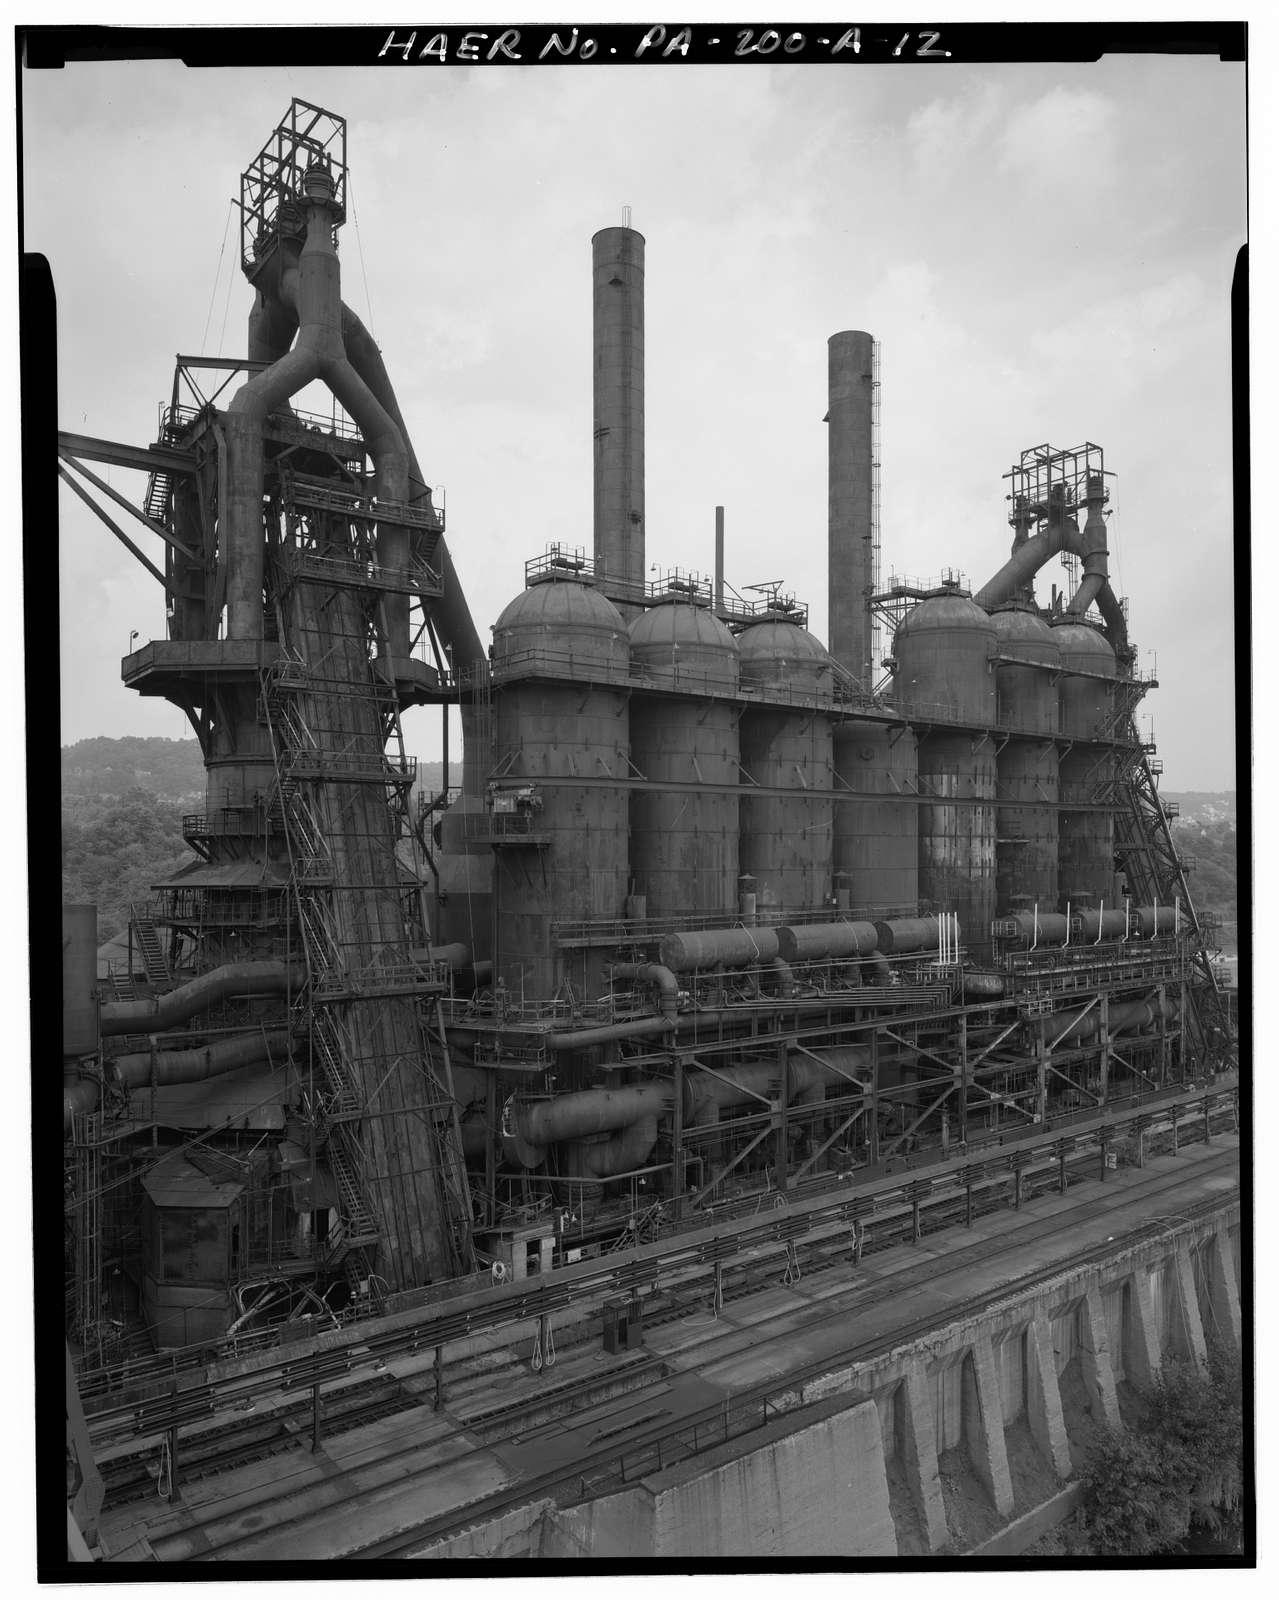 U.S. Steel Homestead Works, Blast Furnace Plant, Along Monongahela River, Homestead, Allegheny County, PA